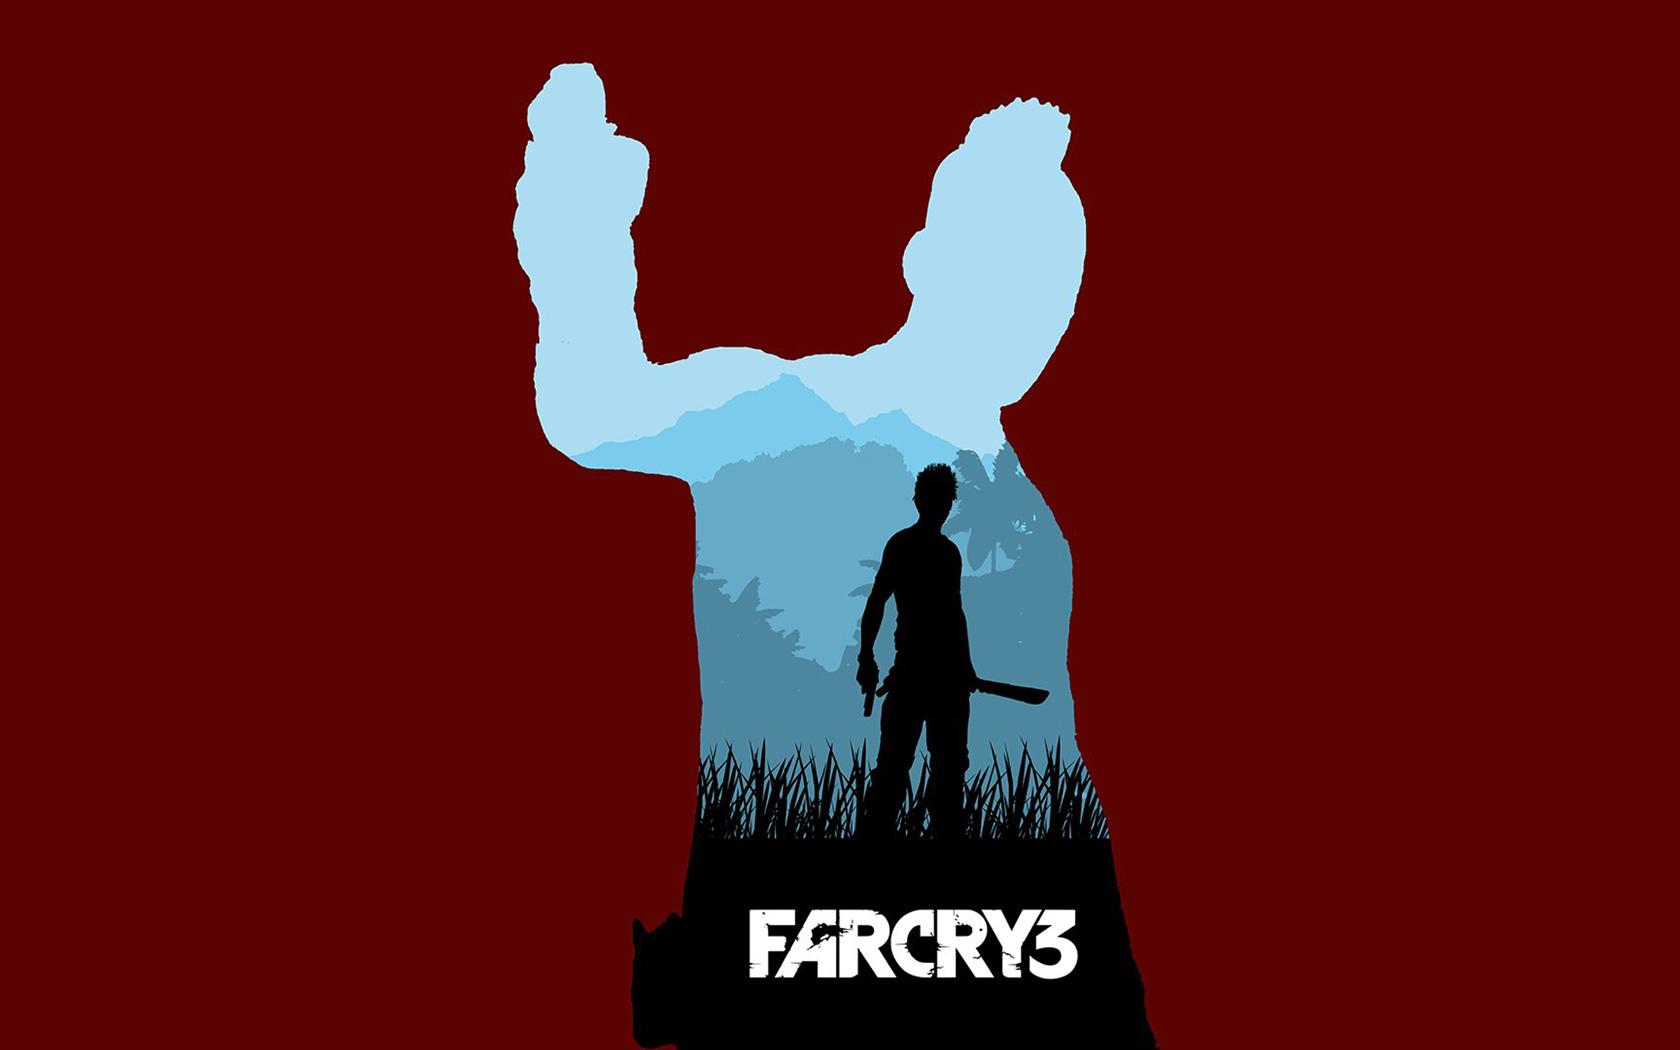 Free Far Cry 3 Wallpaper in 1680x1050